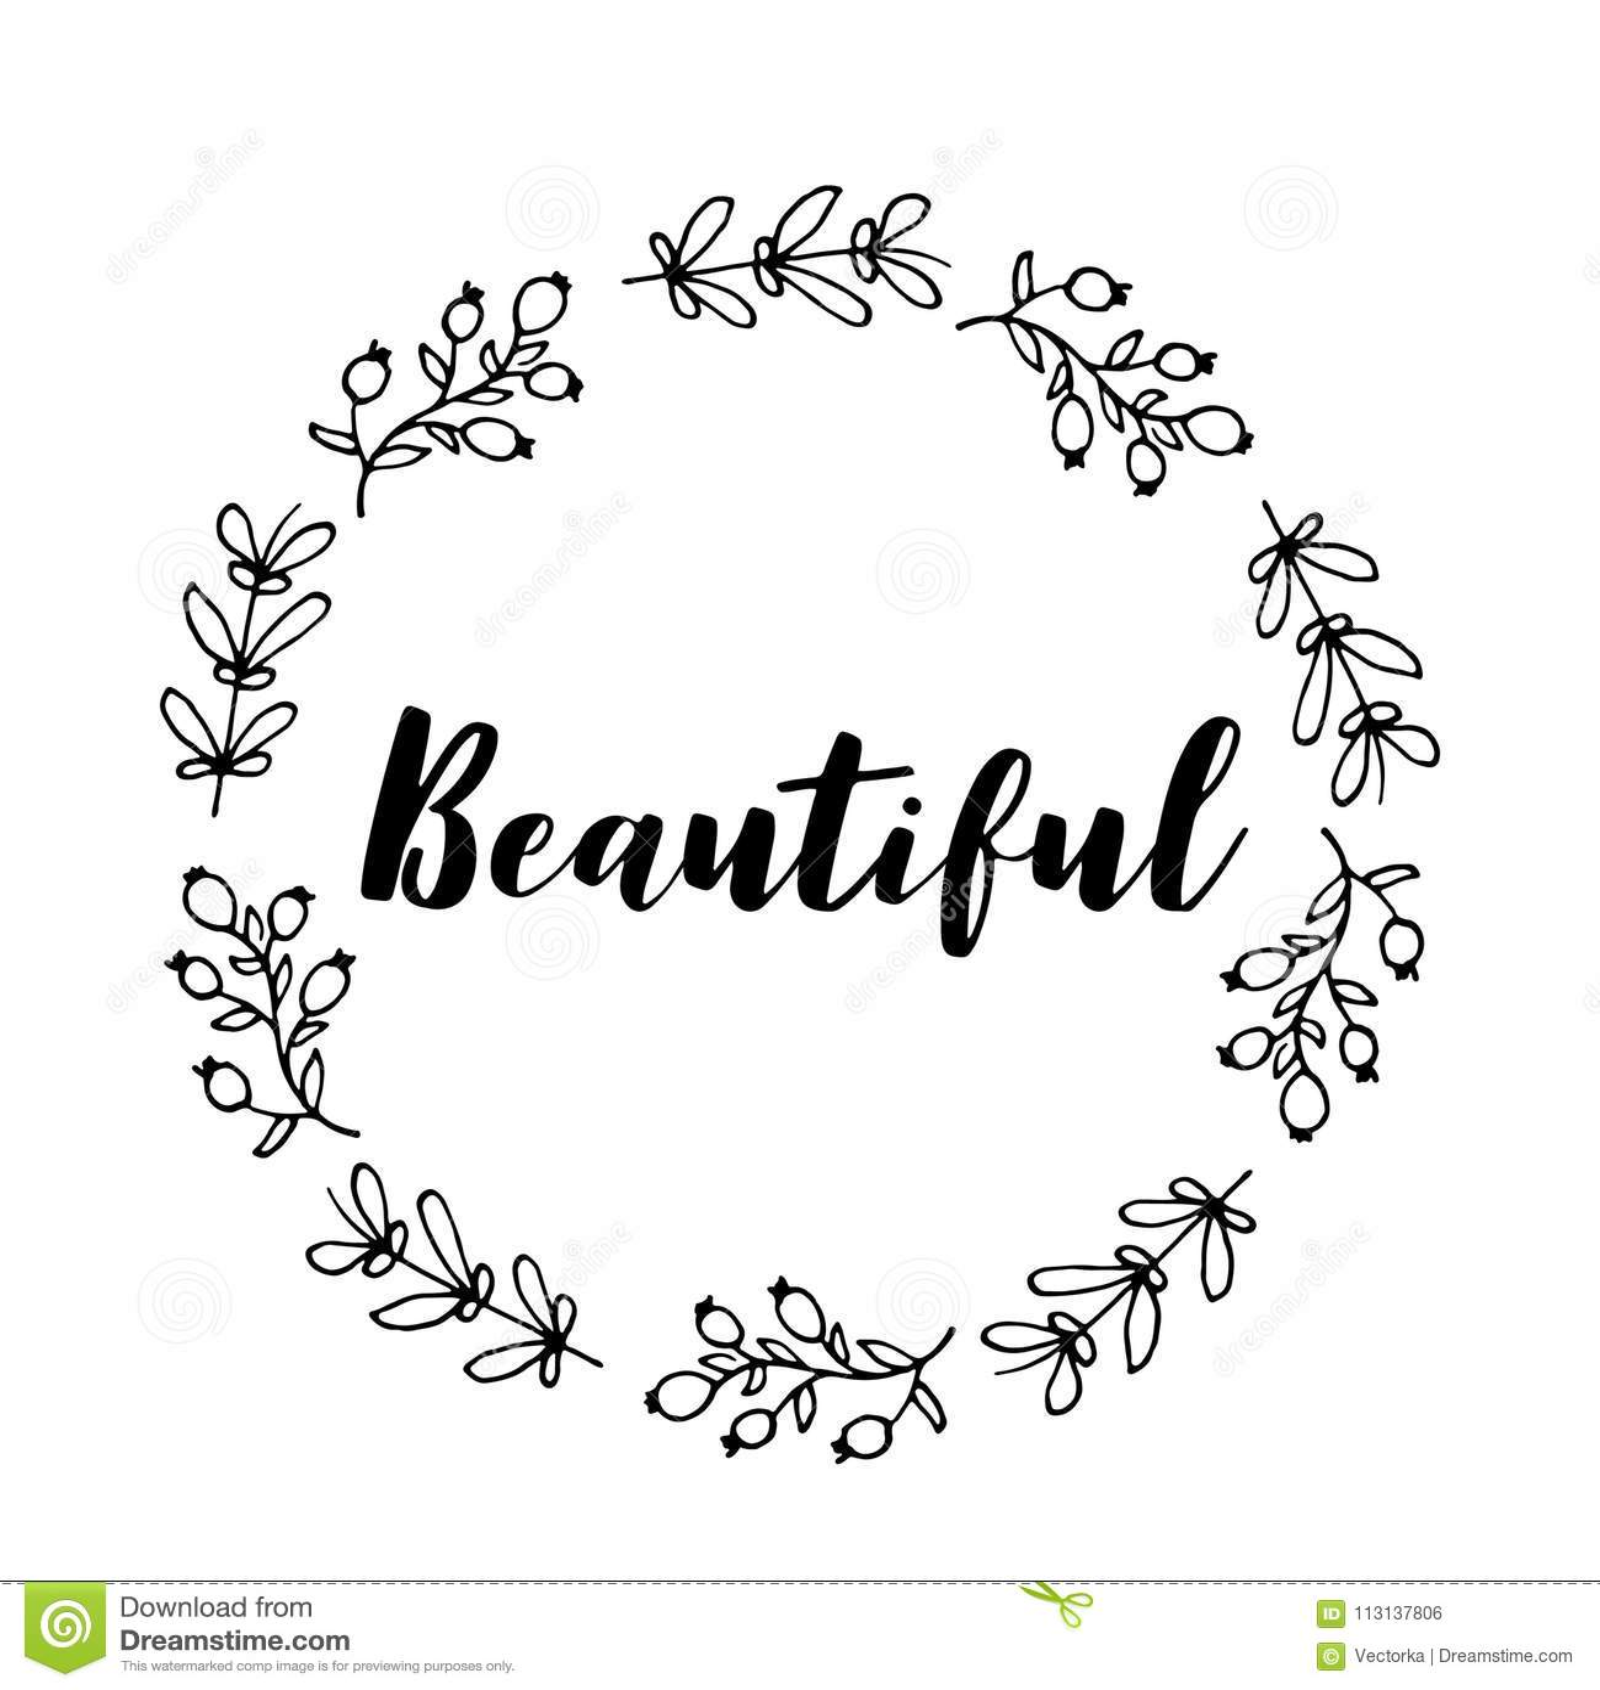 beautiful text flower wreath hand drawn laurel greeting card